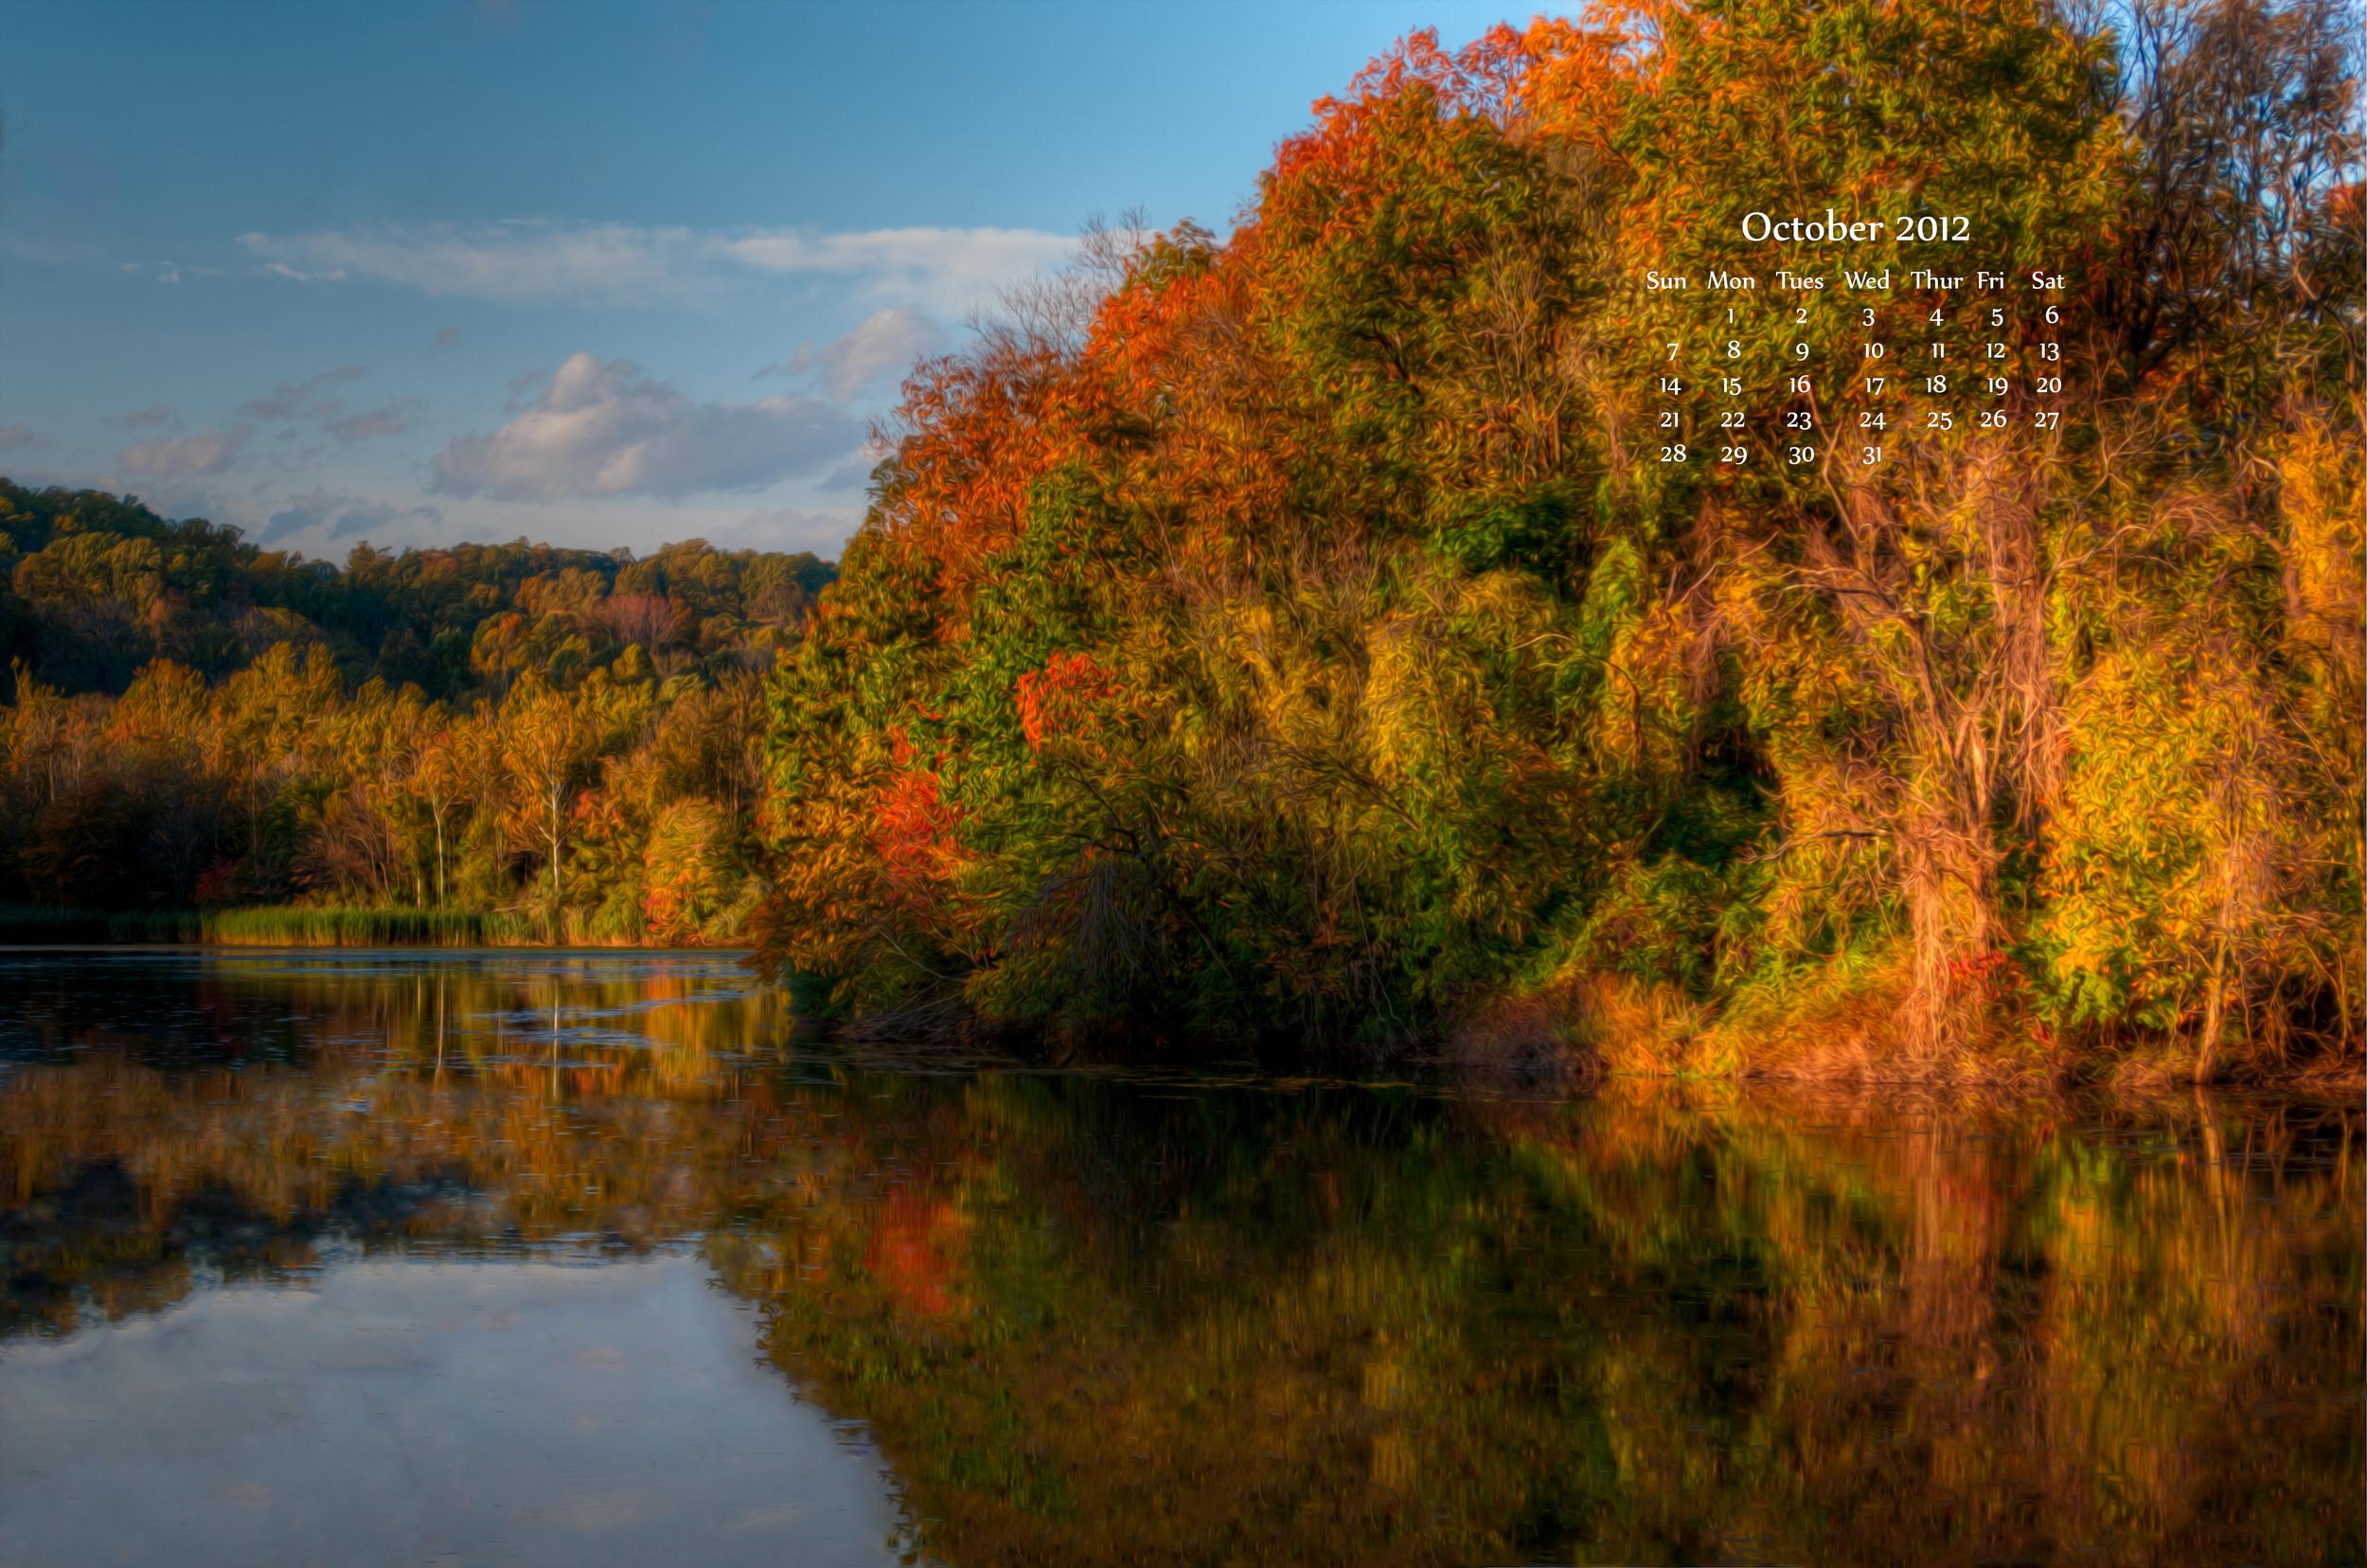 October 2012 Calendar Fall Foliage